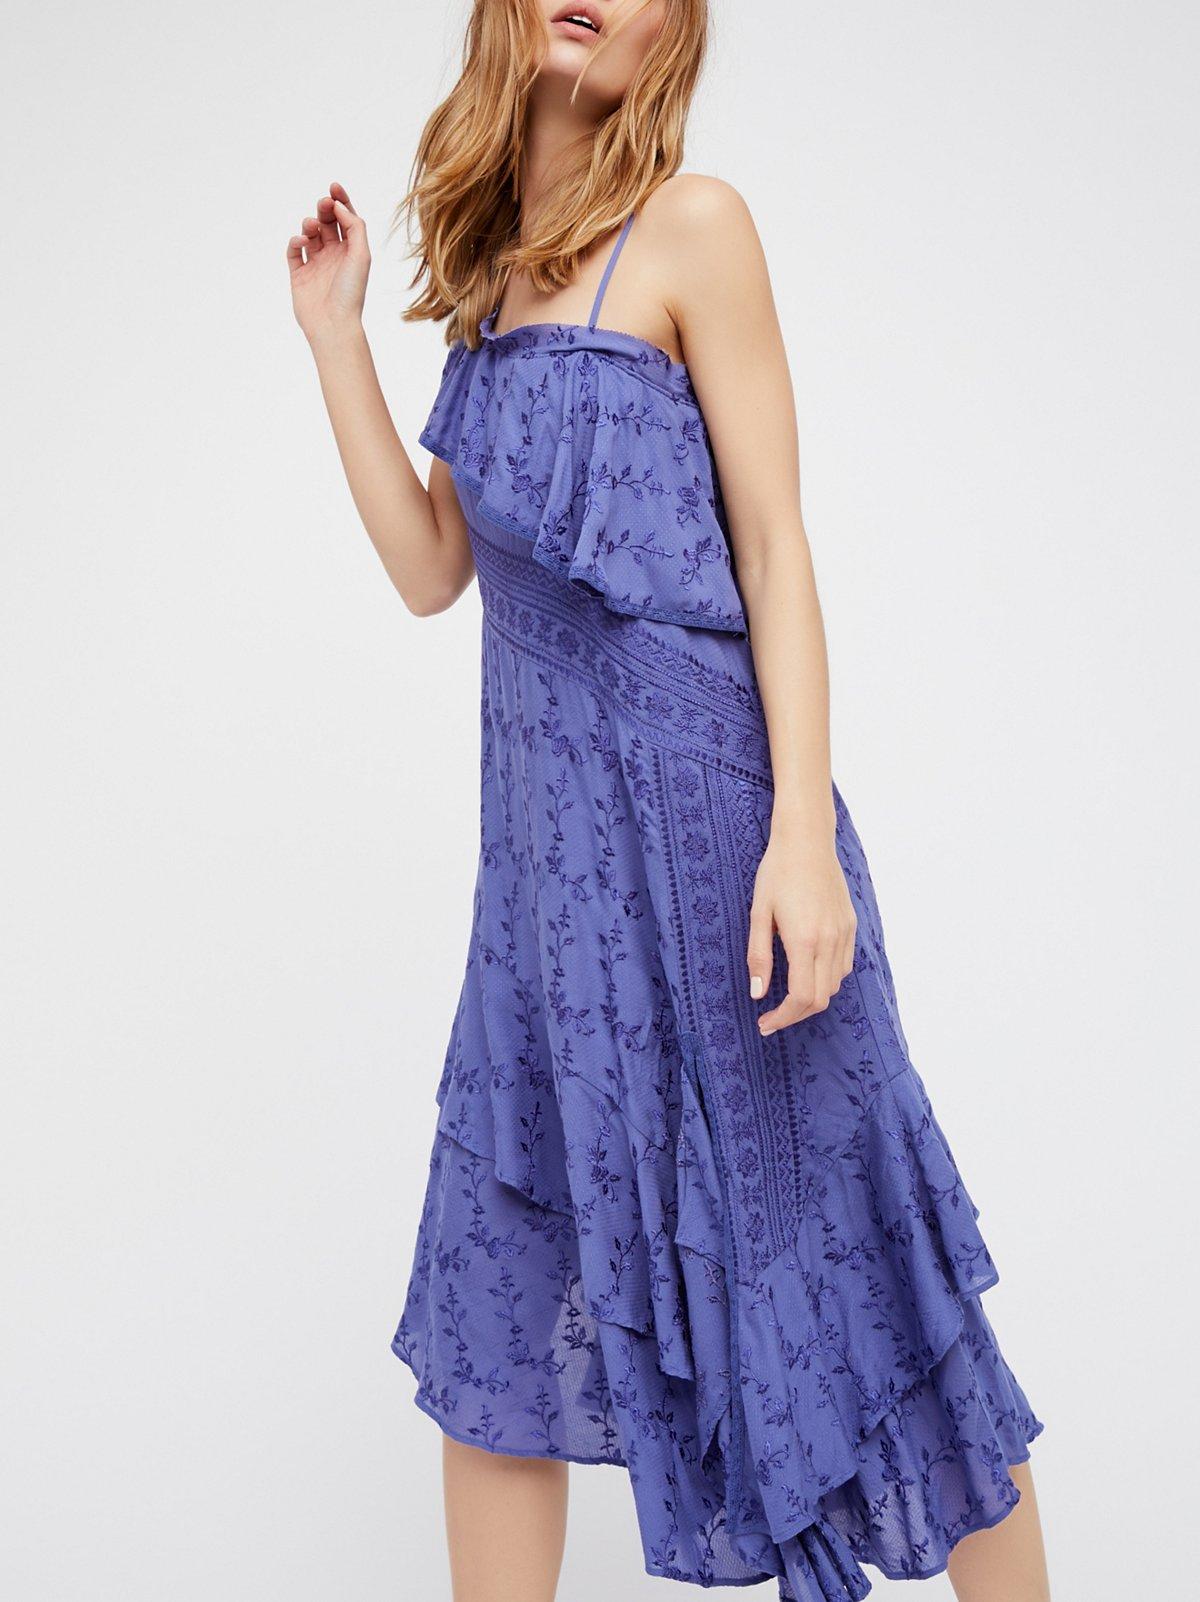 Eastern Sun Midi Dress